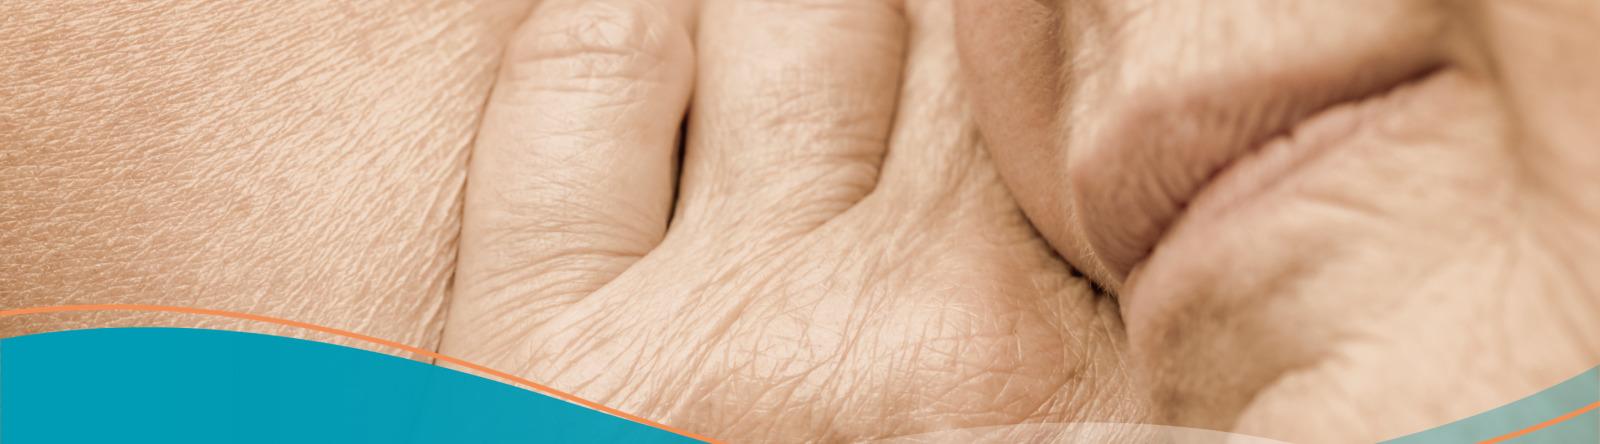 TENA ProSkin Accredited by Skin Health Alliance